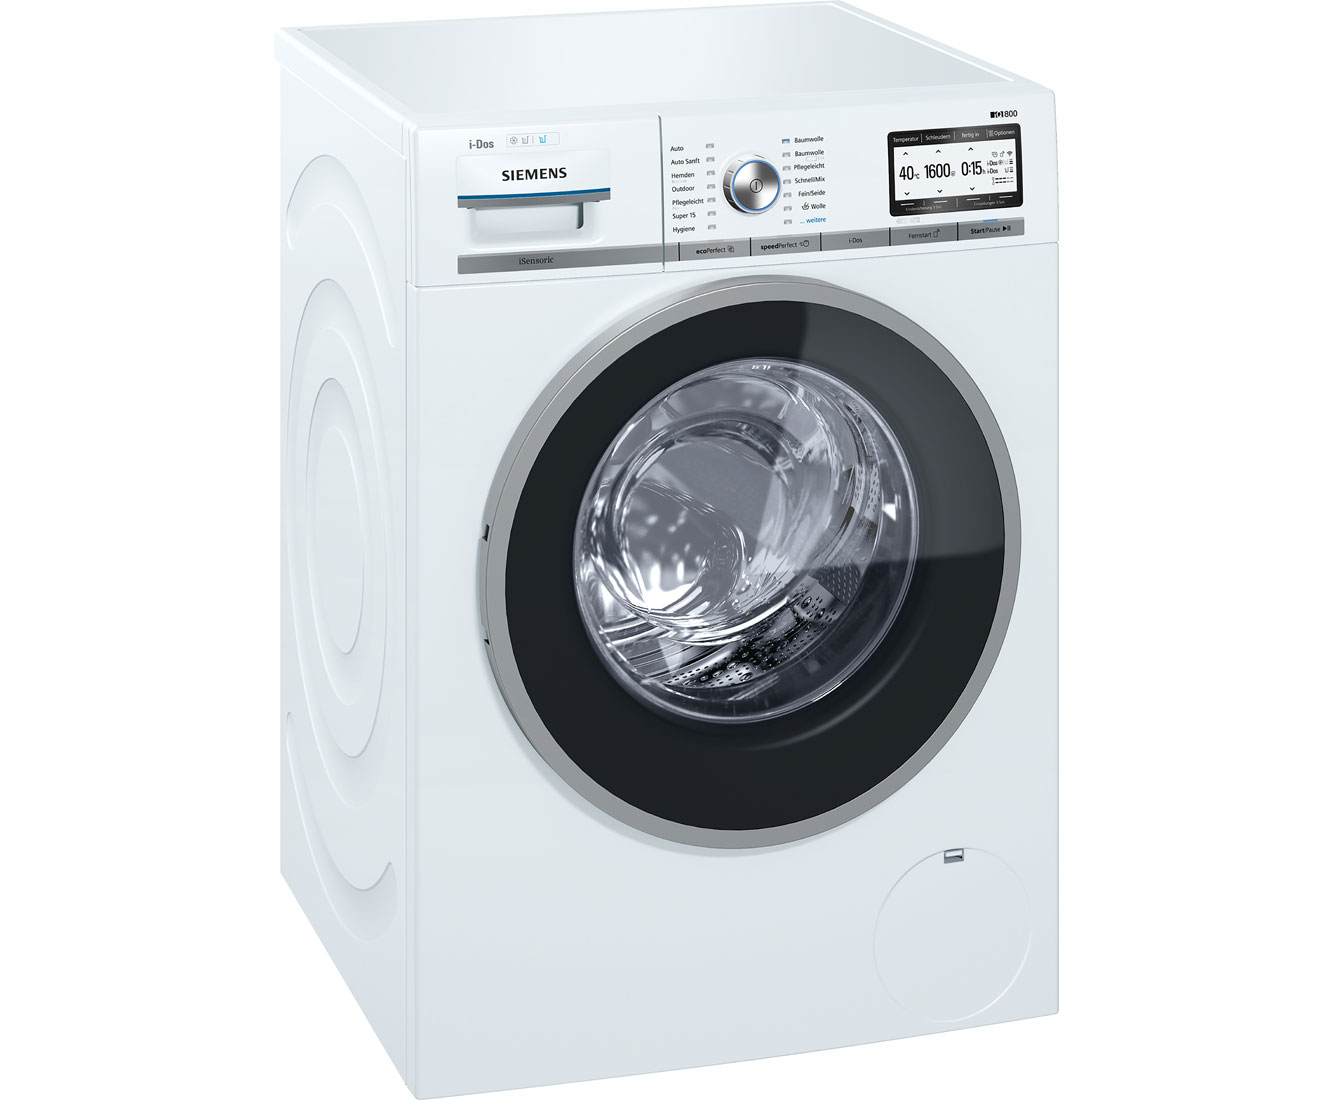 Siemens iq800 wm6yh841 waschmaschine 8 kg 1600 u min a